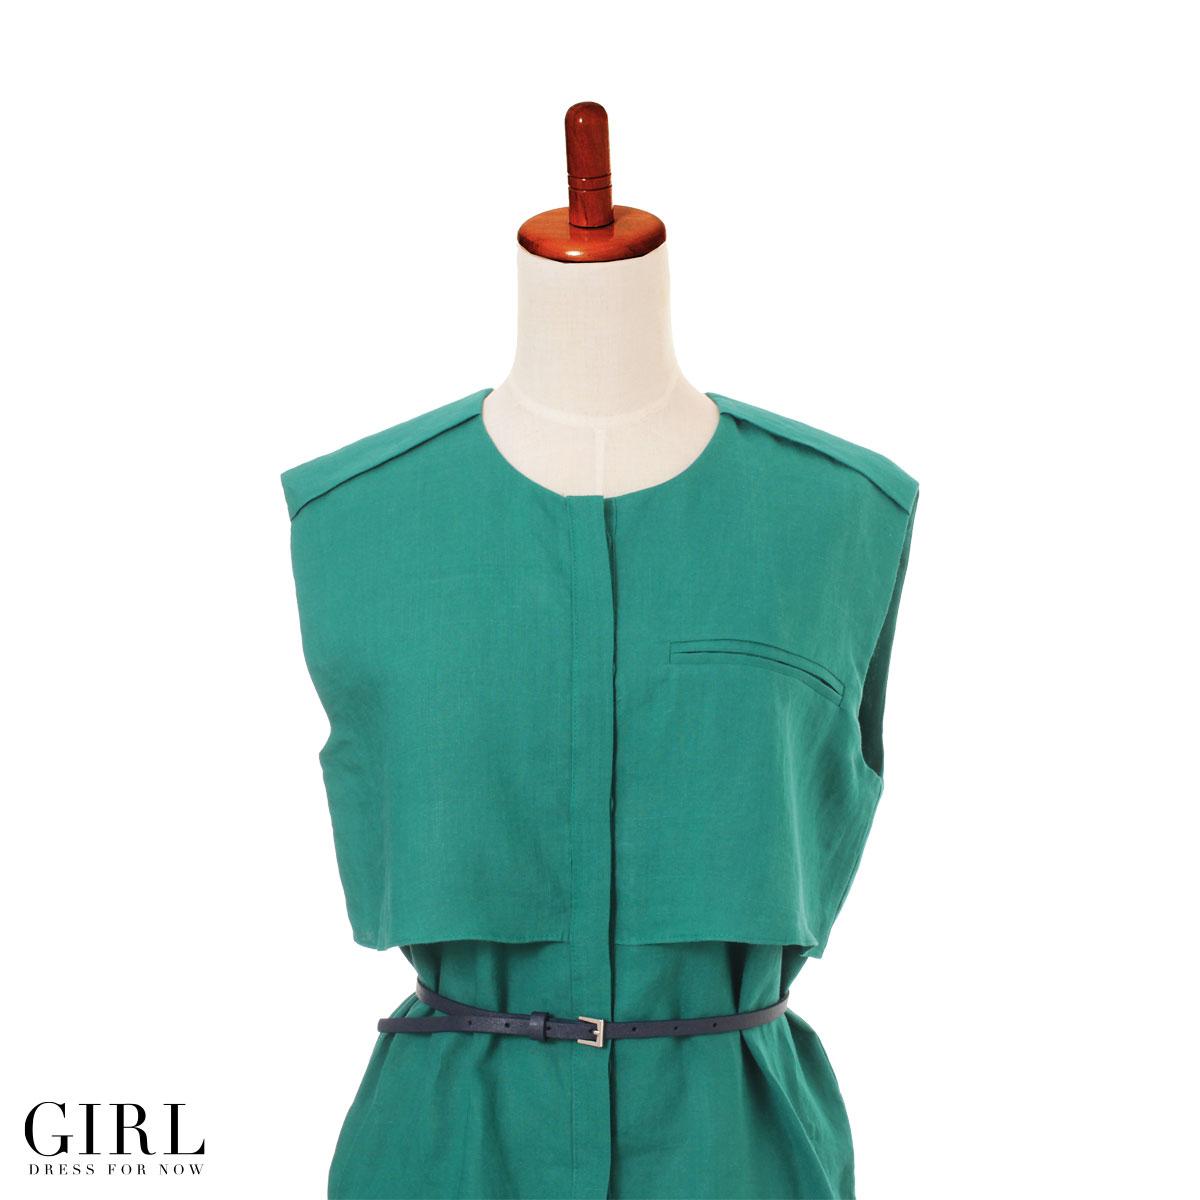 Dress shop GIRL | Rakuten Global Market: One piece dress invited ...